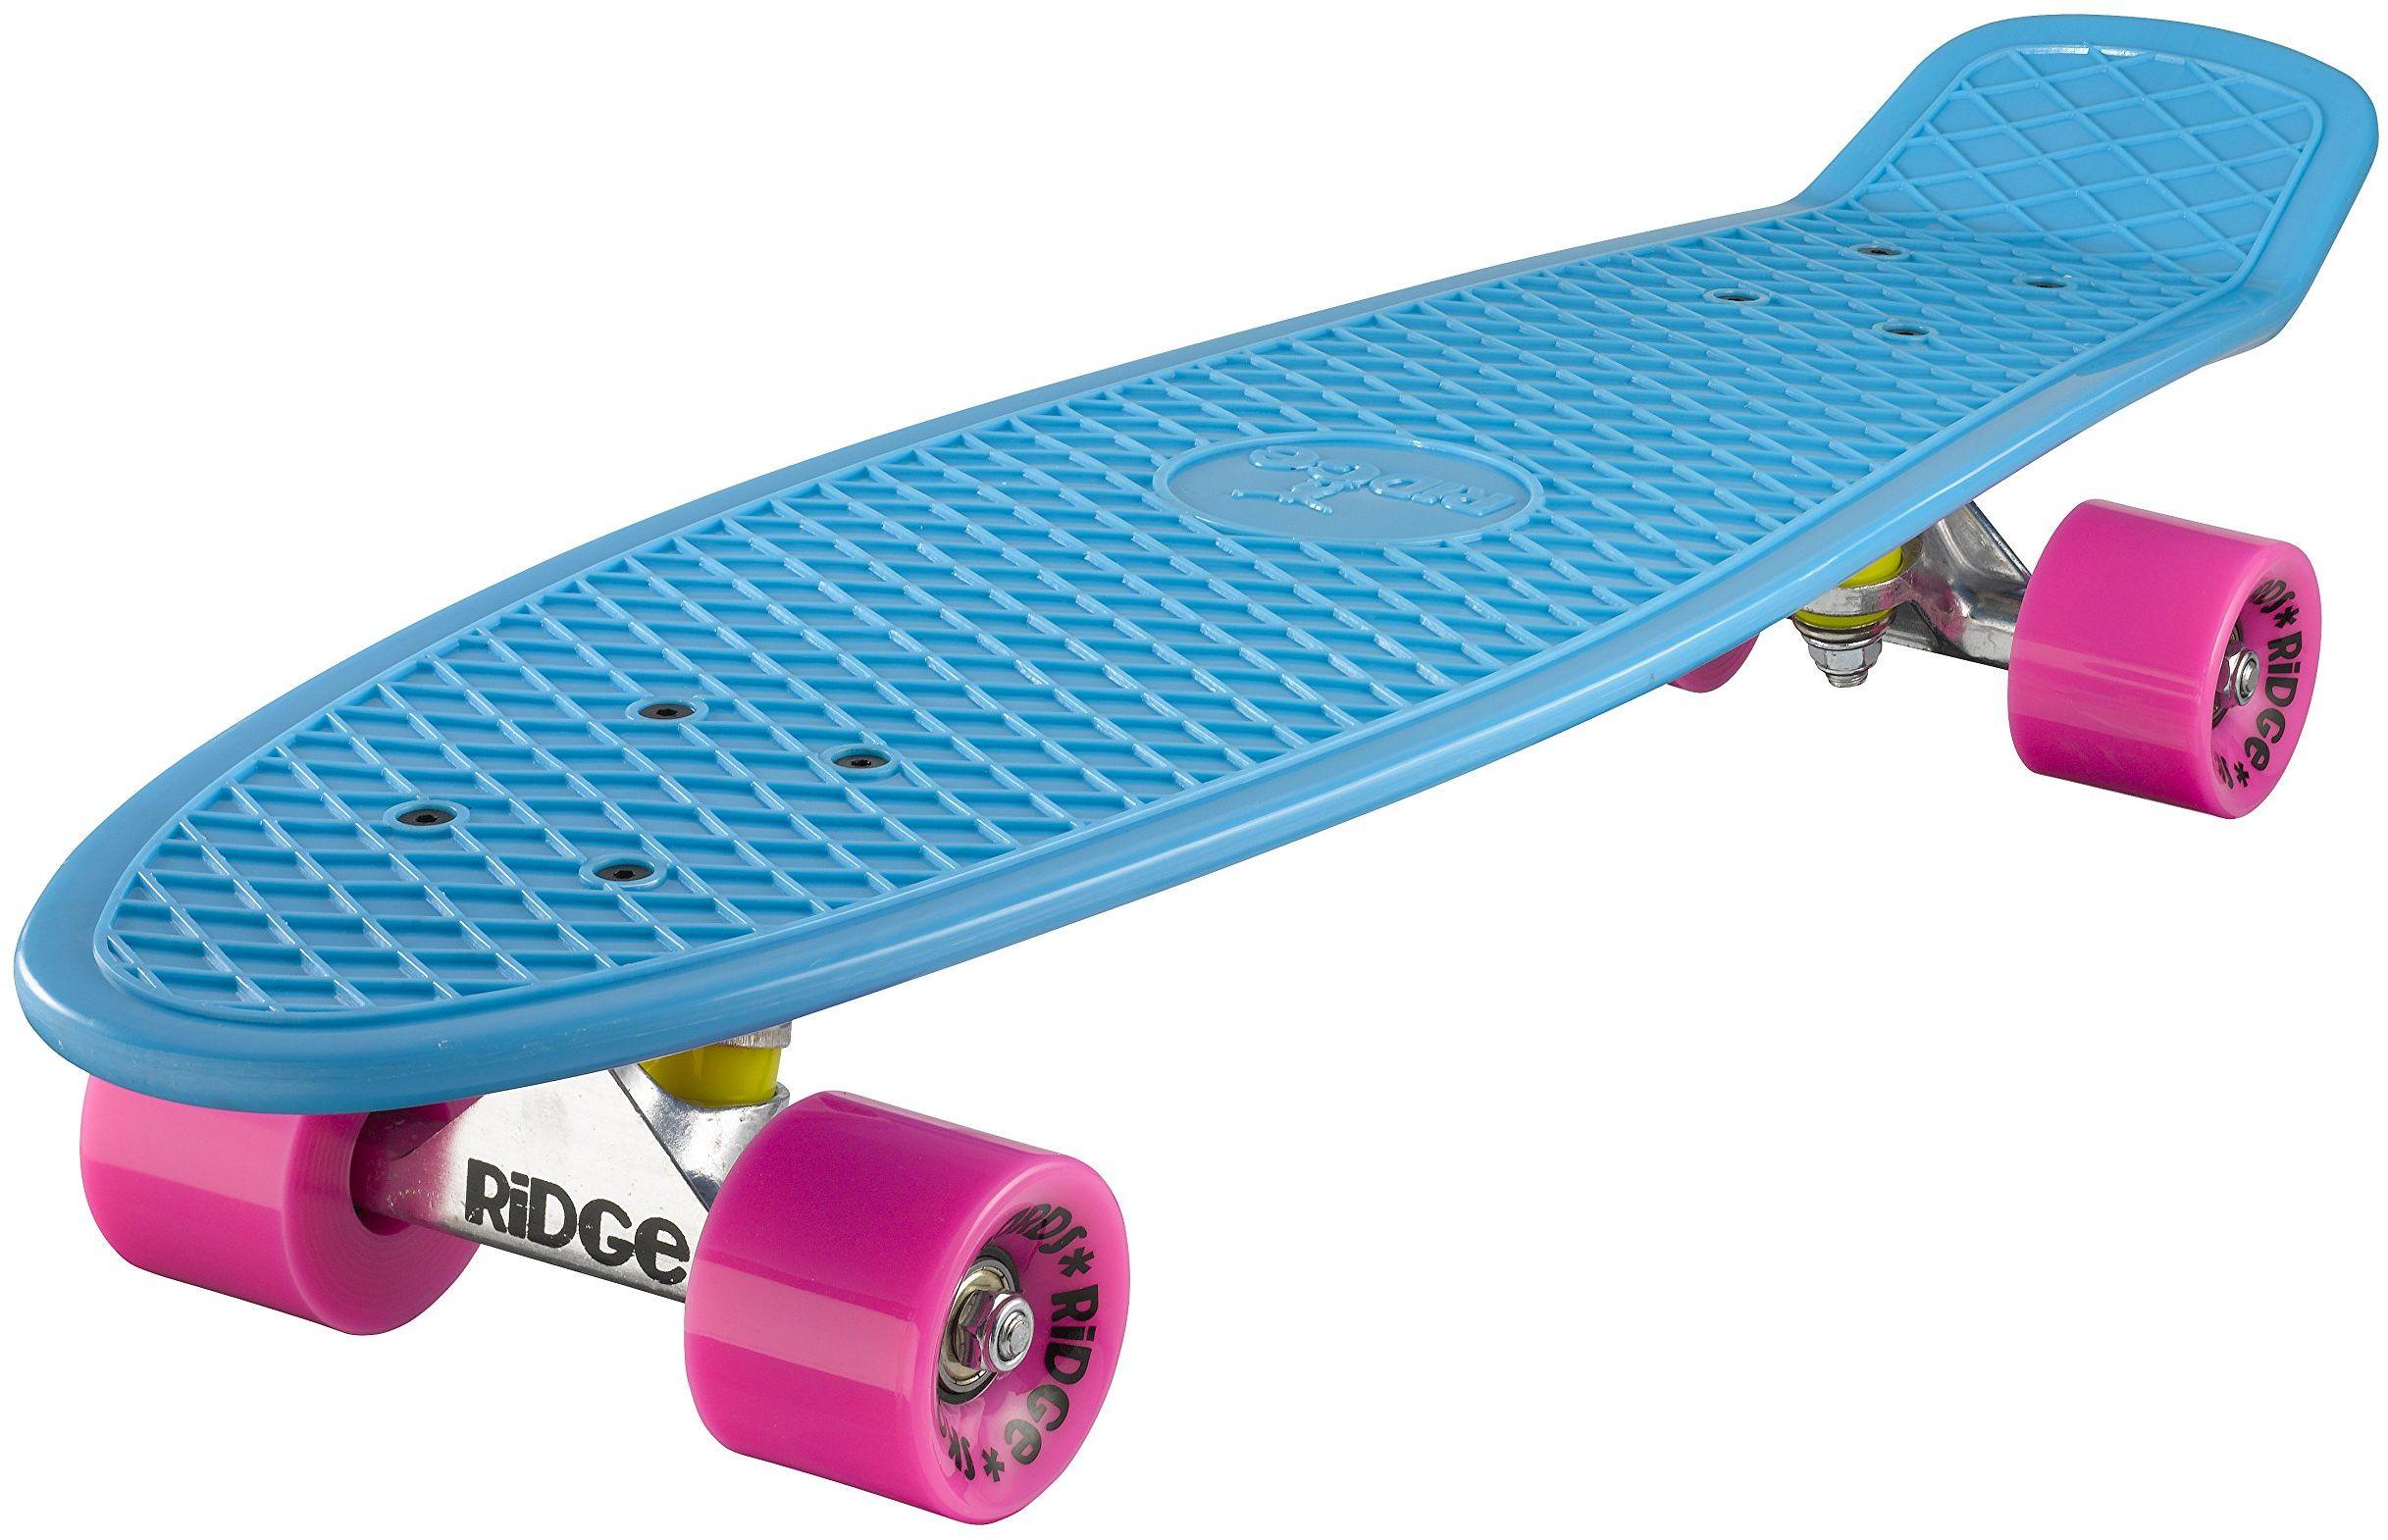 Ridge Deskorolka Big Brother nikiel 69 cm Mini Cruiser, niebieska/różowa